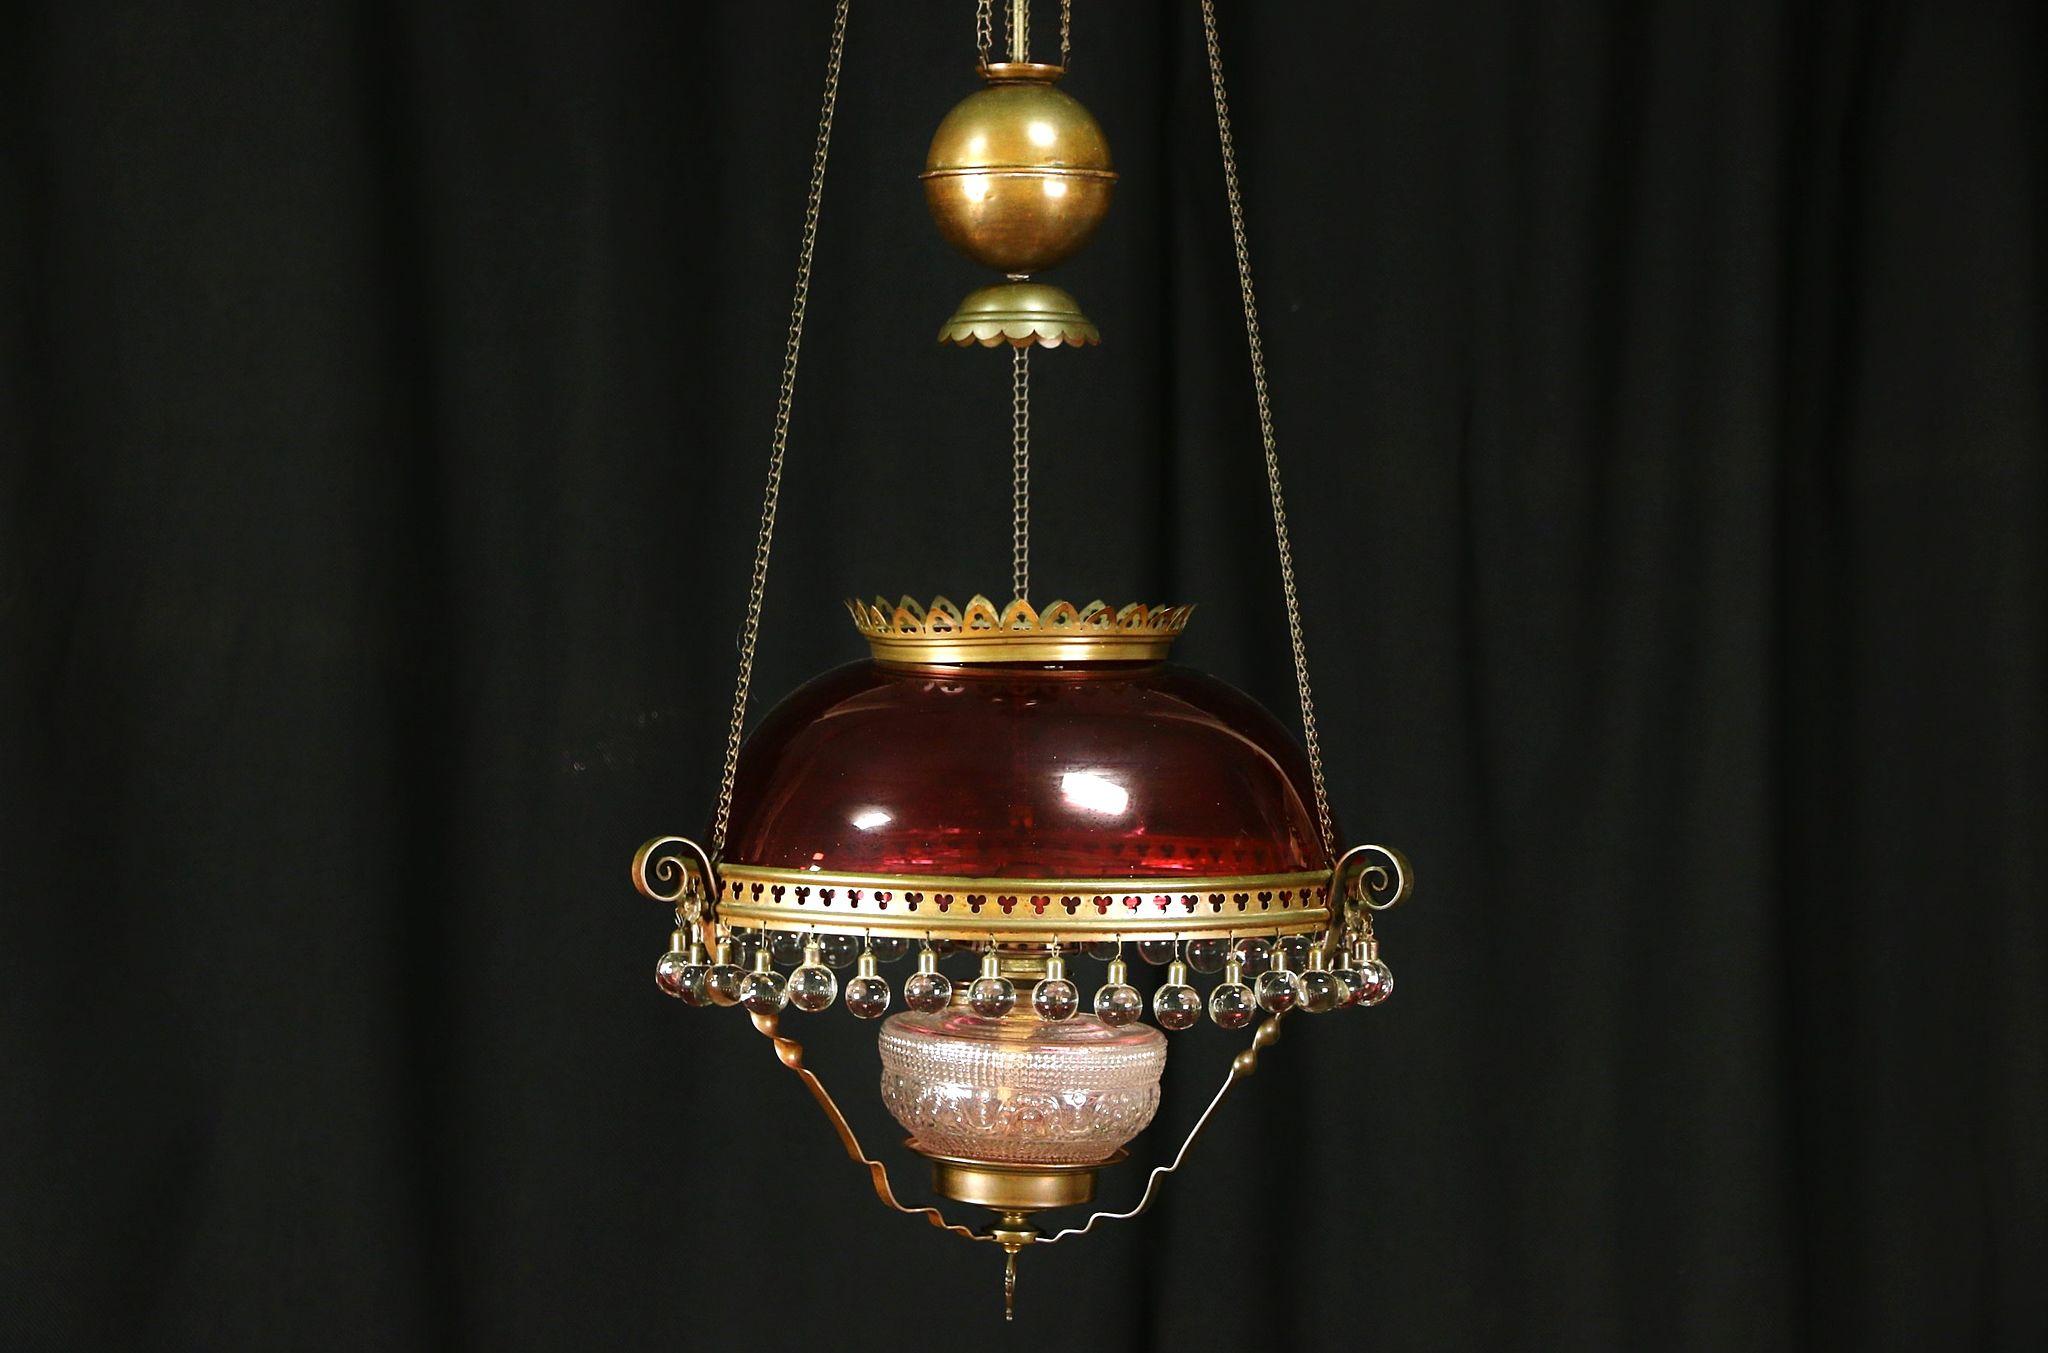 SOLD - Victorian 1880 Antique Hanging Light Kerosene Lamp, Cranberry ...